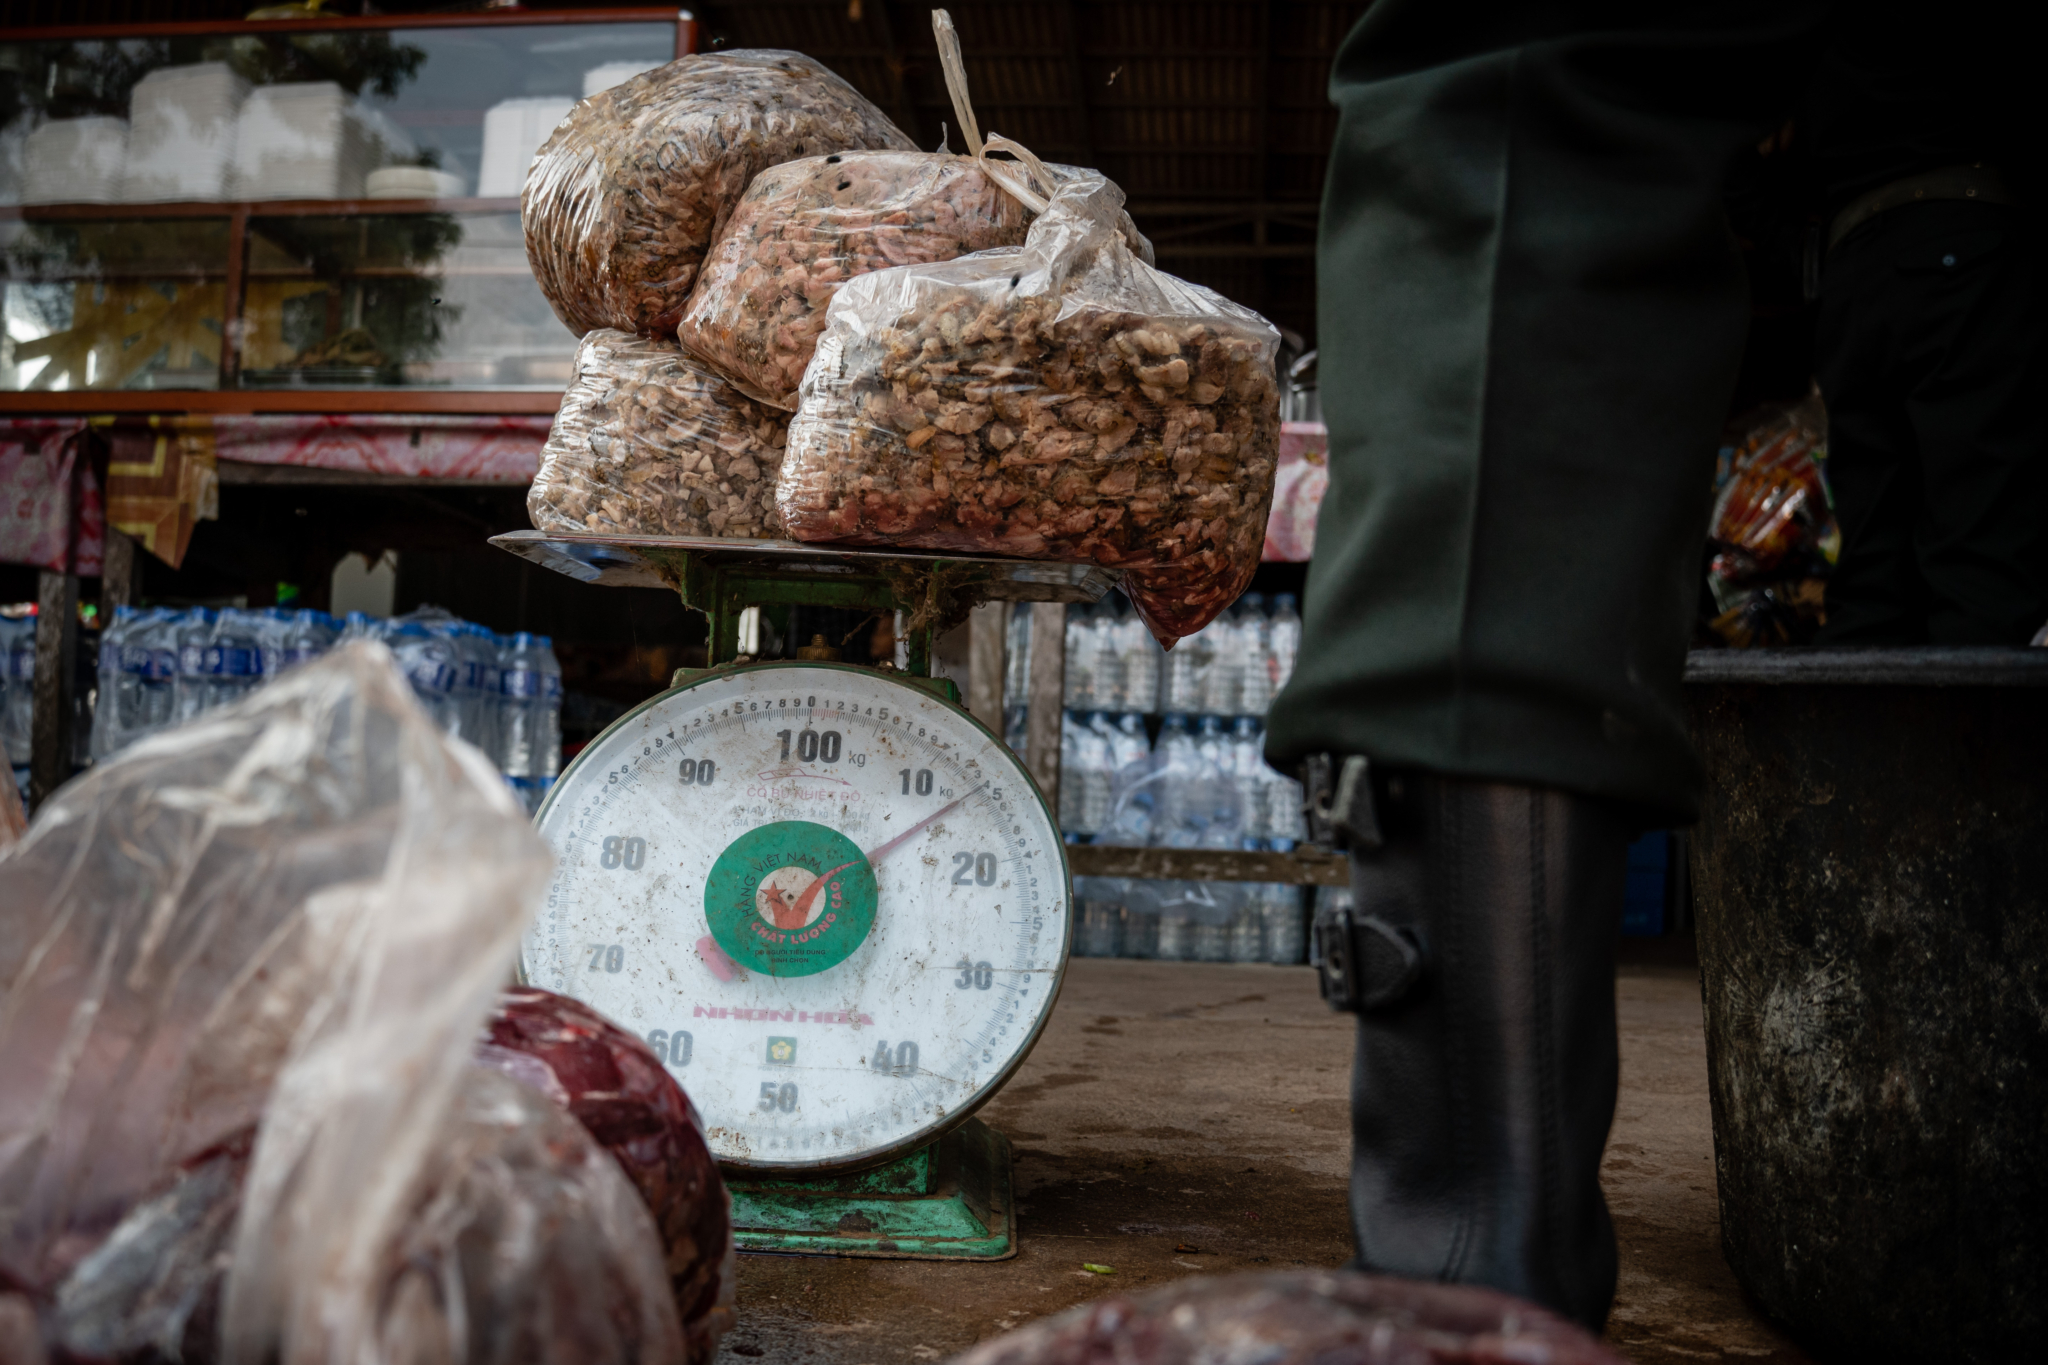 Rangers weighing wildlife meat in restaurant